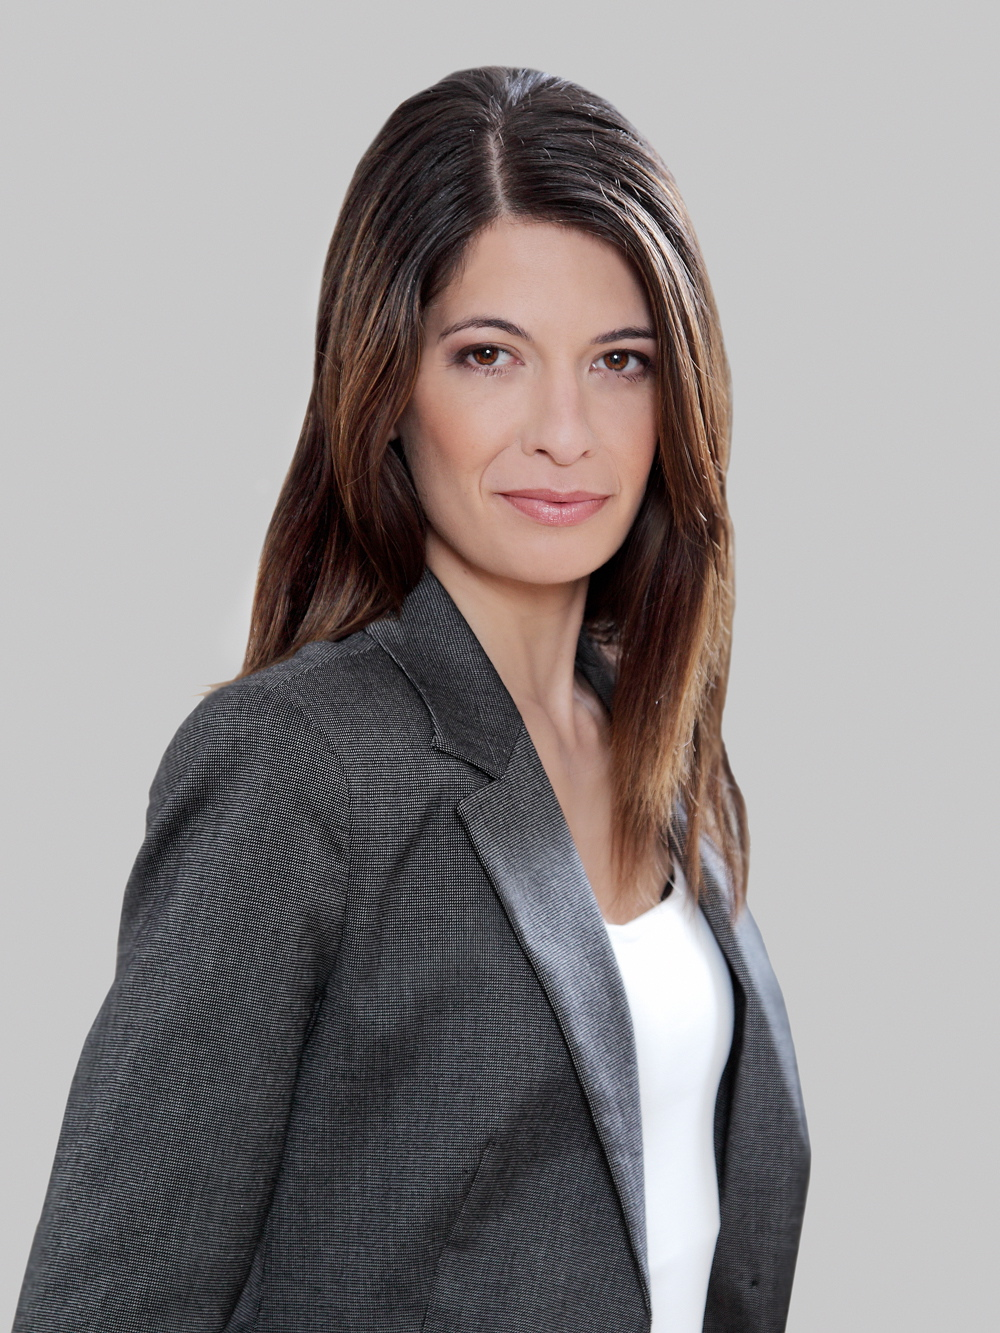 Linda Zervakis Wikipedia